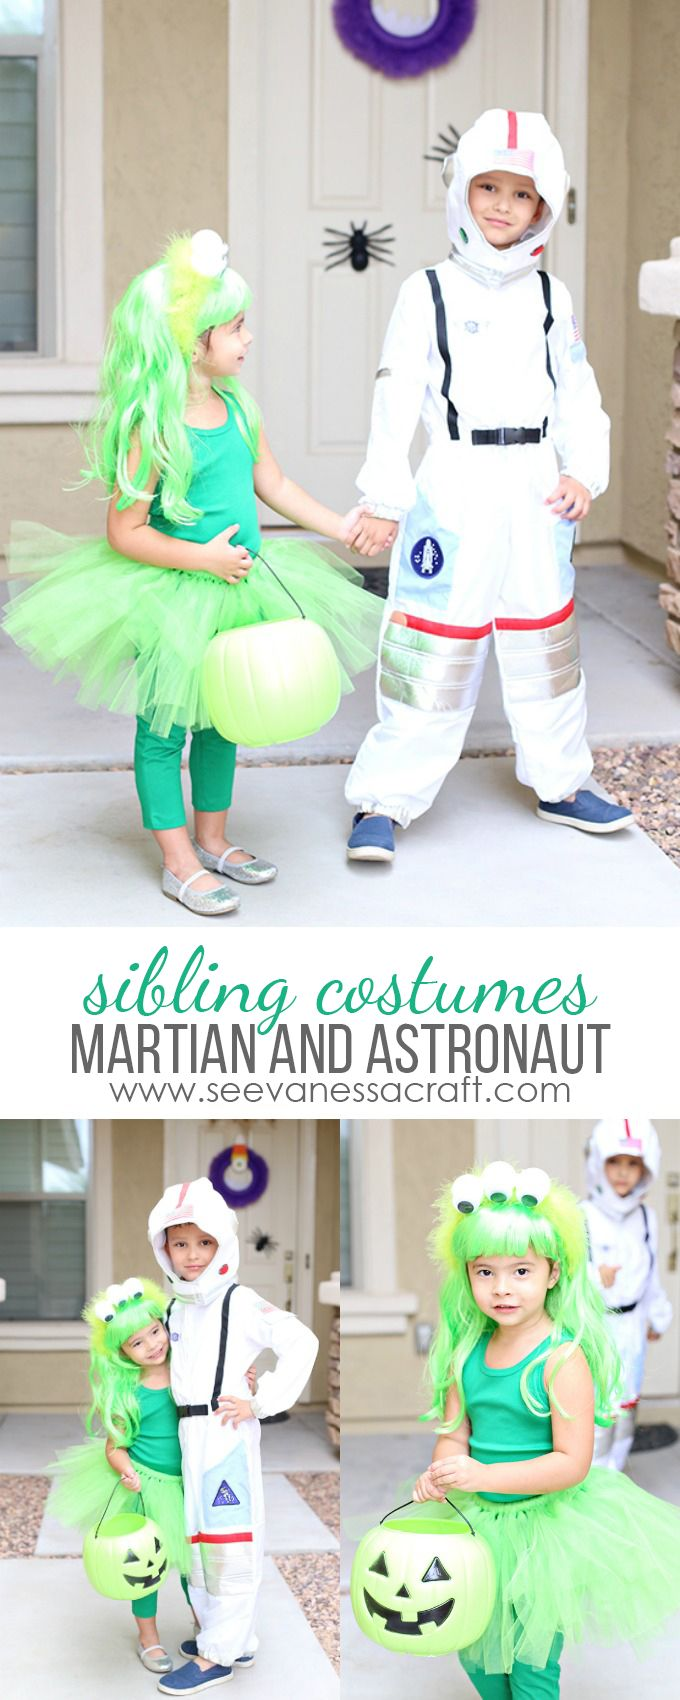 DIY Martian or Alien and Astronaut Halloween Sibling Costume Idea